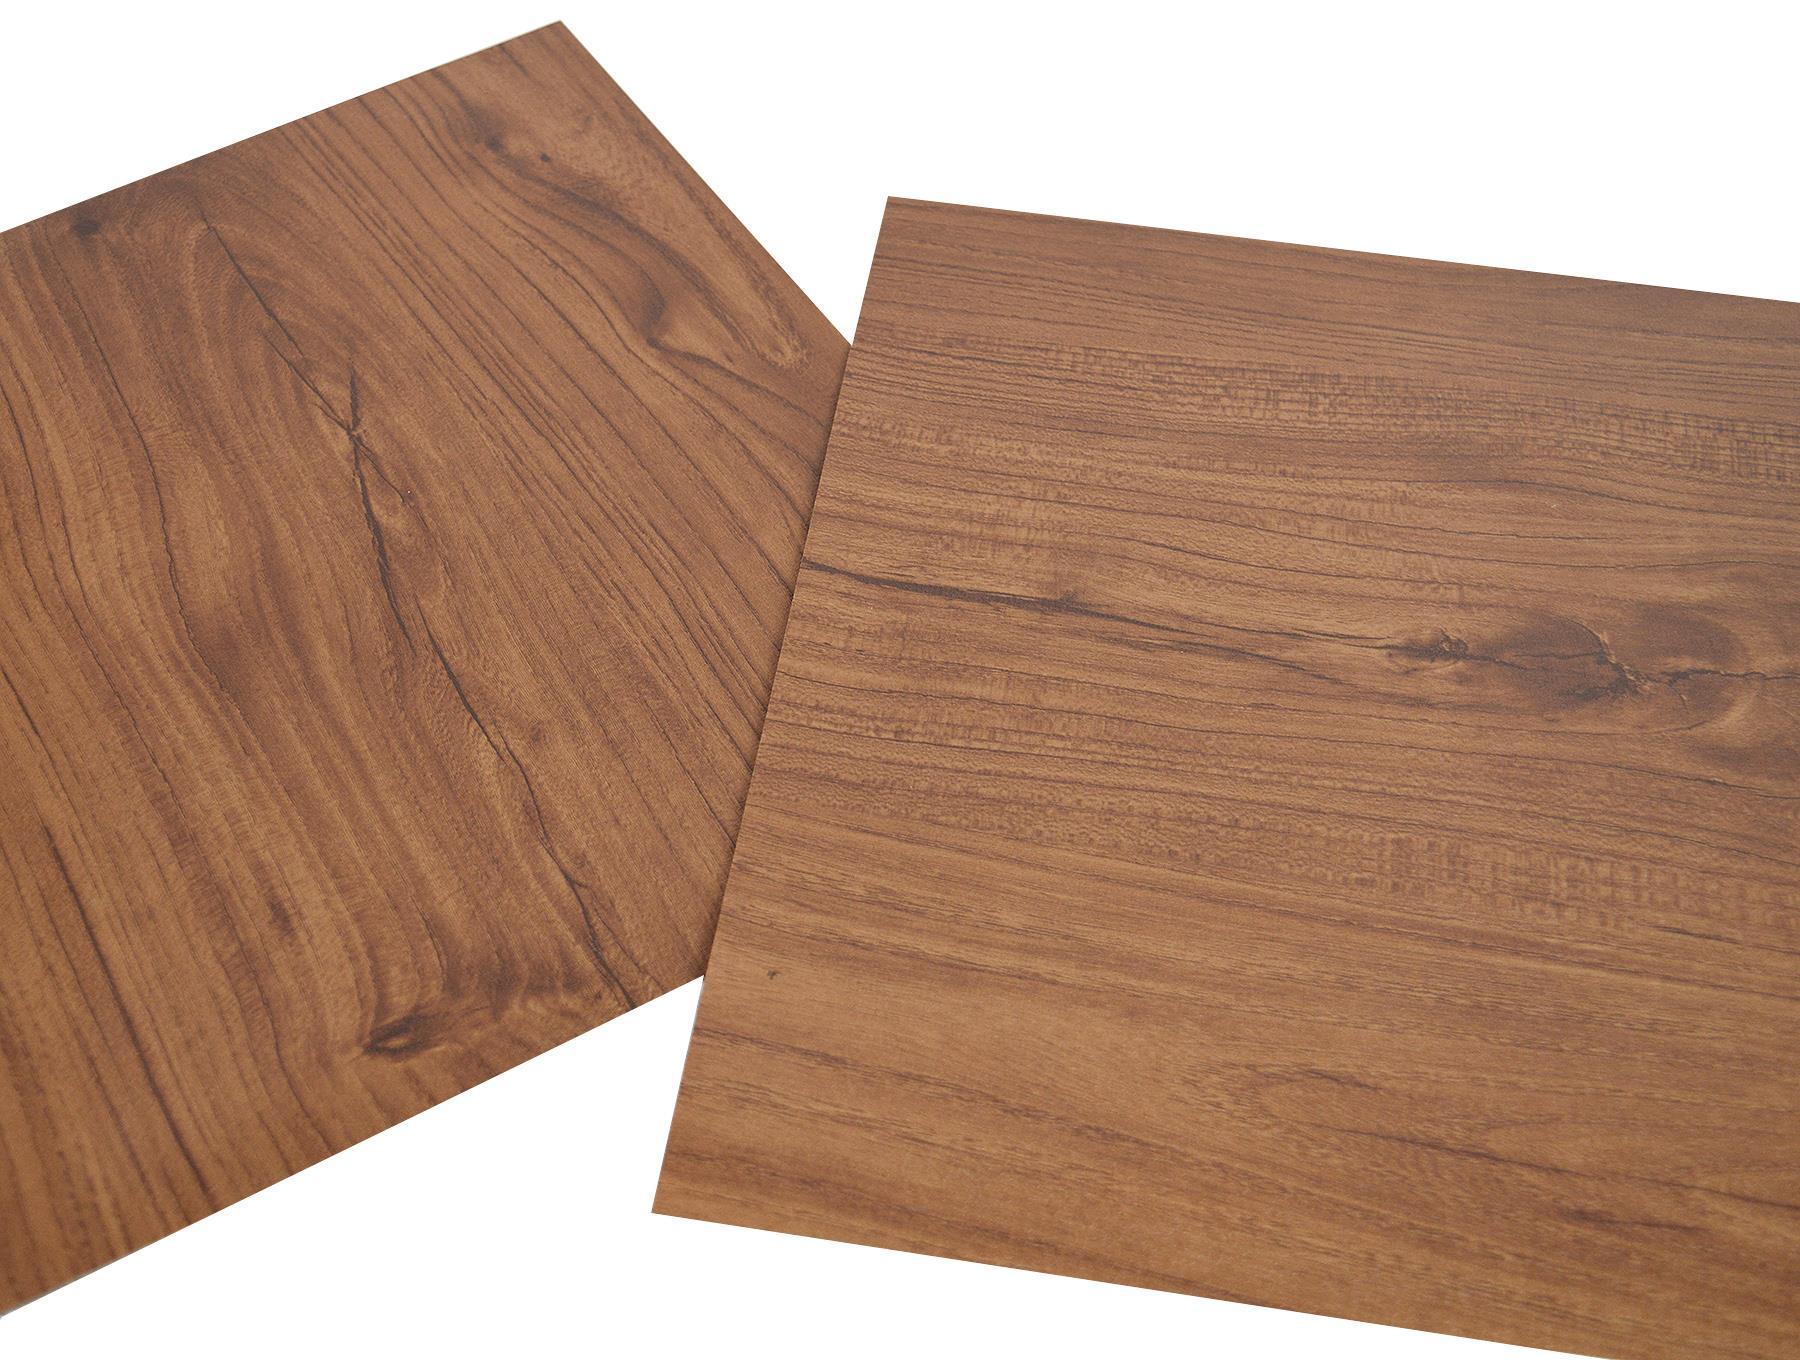 Floor-Tiles-Self-Adhesive-Vinyl-Flooring-Kitchen-Bathroom-Brown-Wood-Grain thumbnail 4